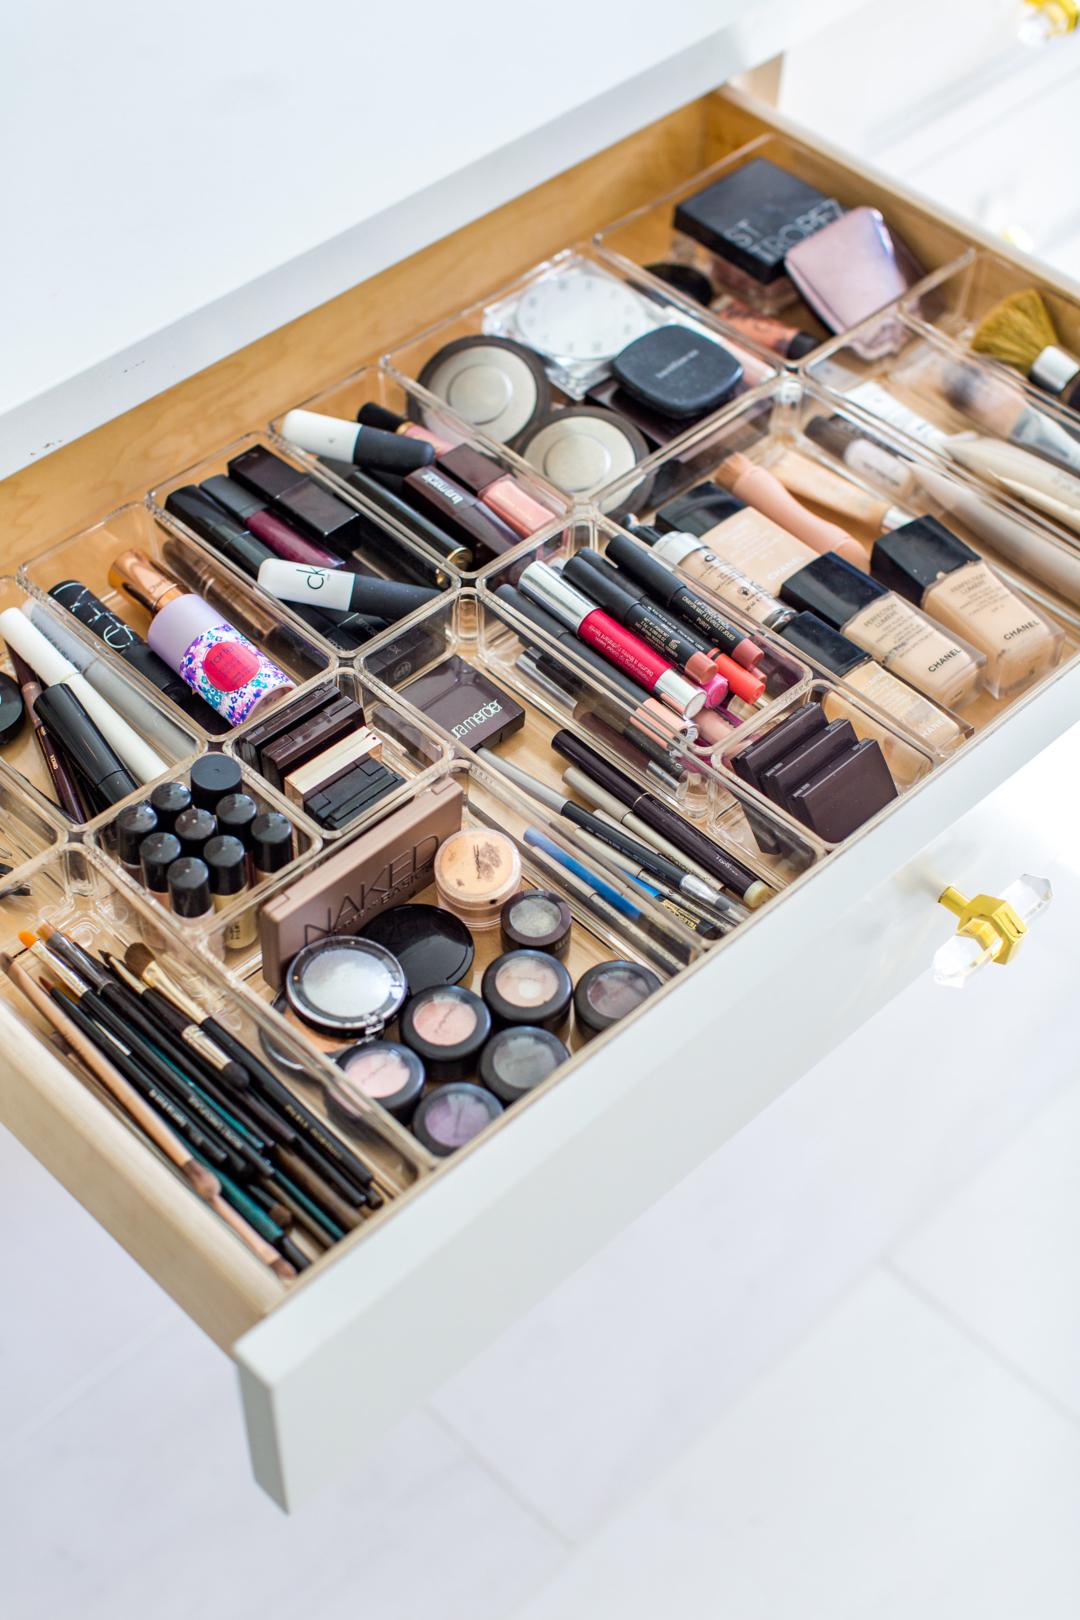 Bathroom drawer dividers for makeup organization